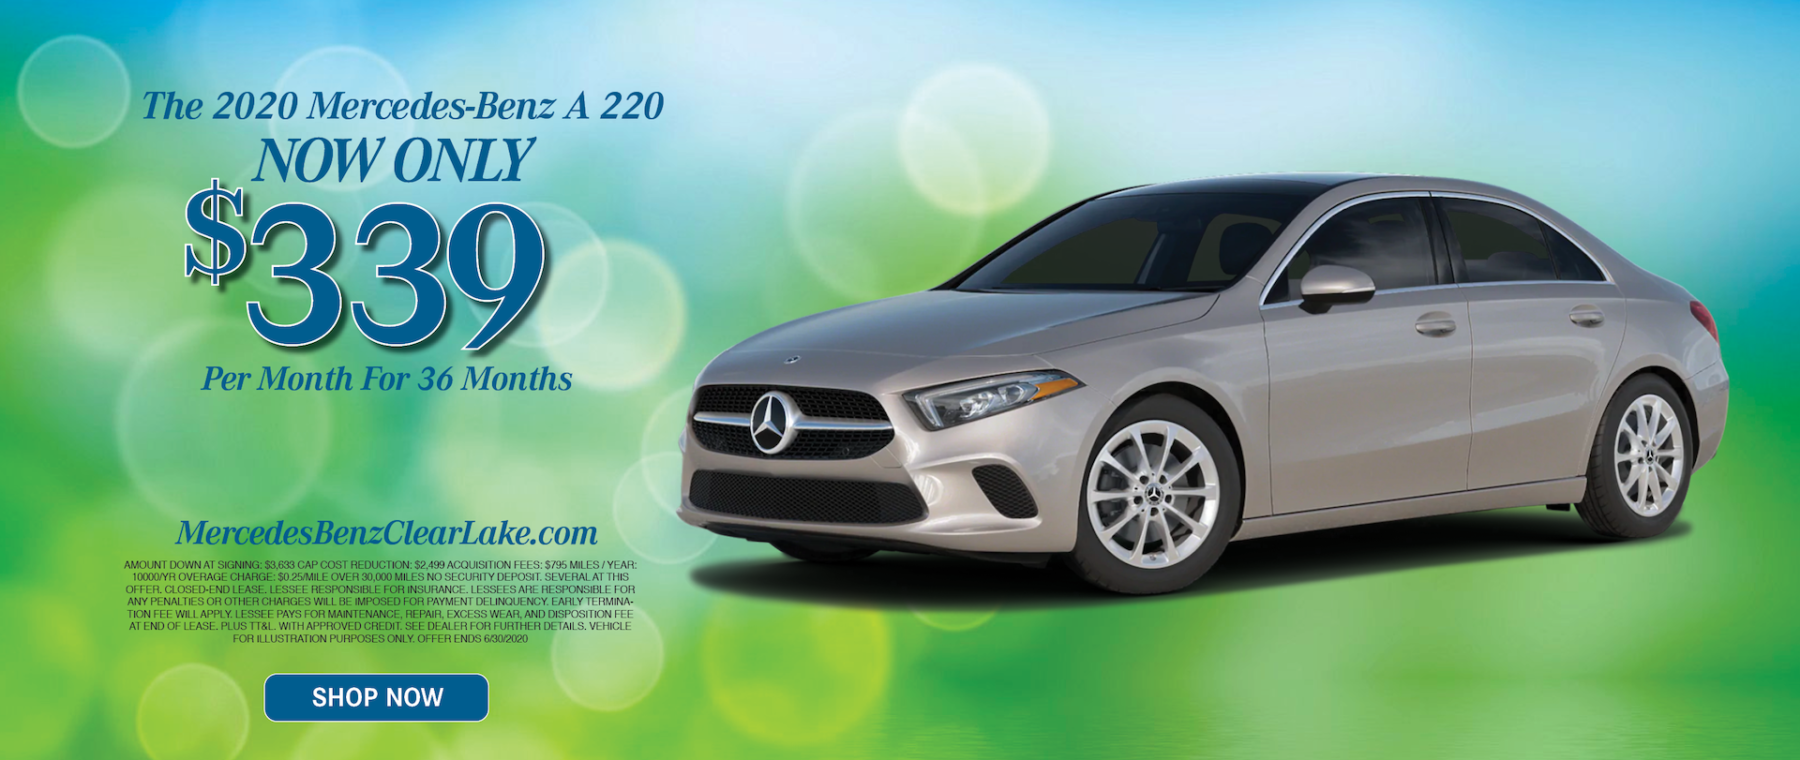 Mercedes-Benz of Clear Lake | Dealer, Service & Finance Center